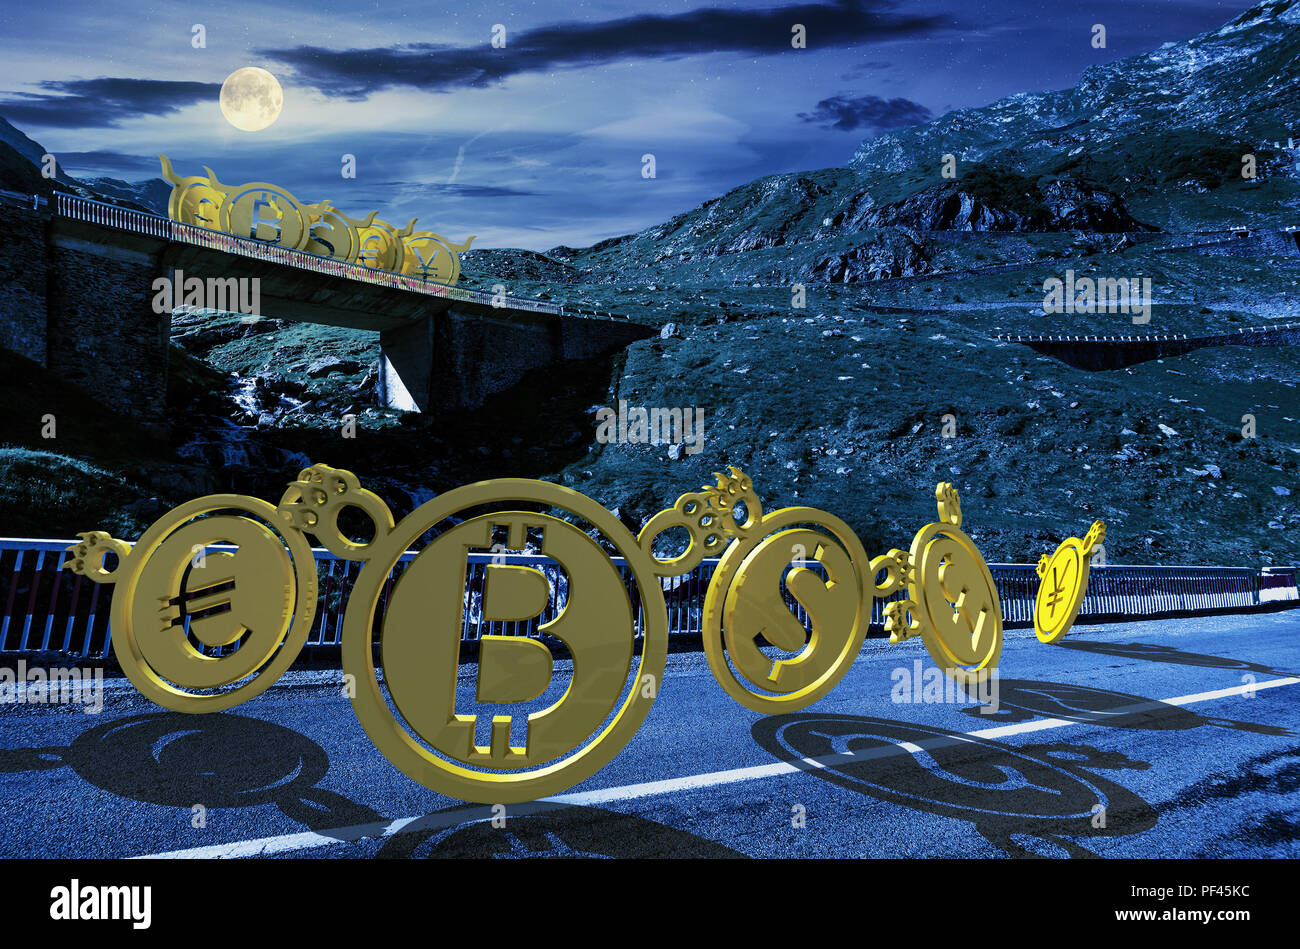 bullish or bearish marketing trend. bears down the road make fun of bulls up on the bridge. currency market trading at night in full moon light - Stock Image